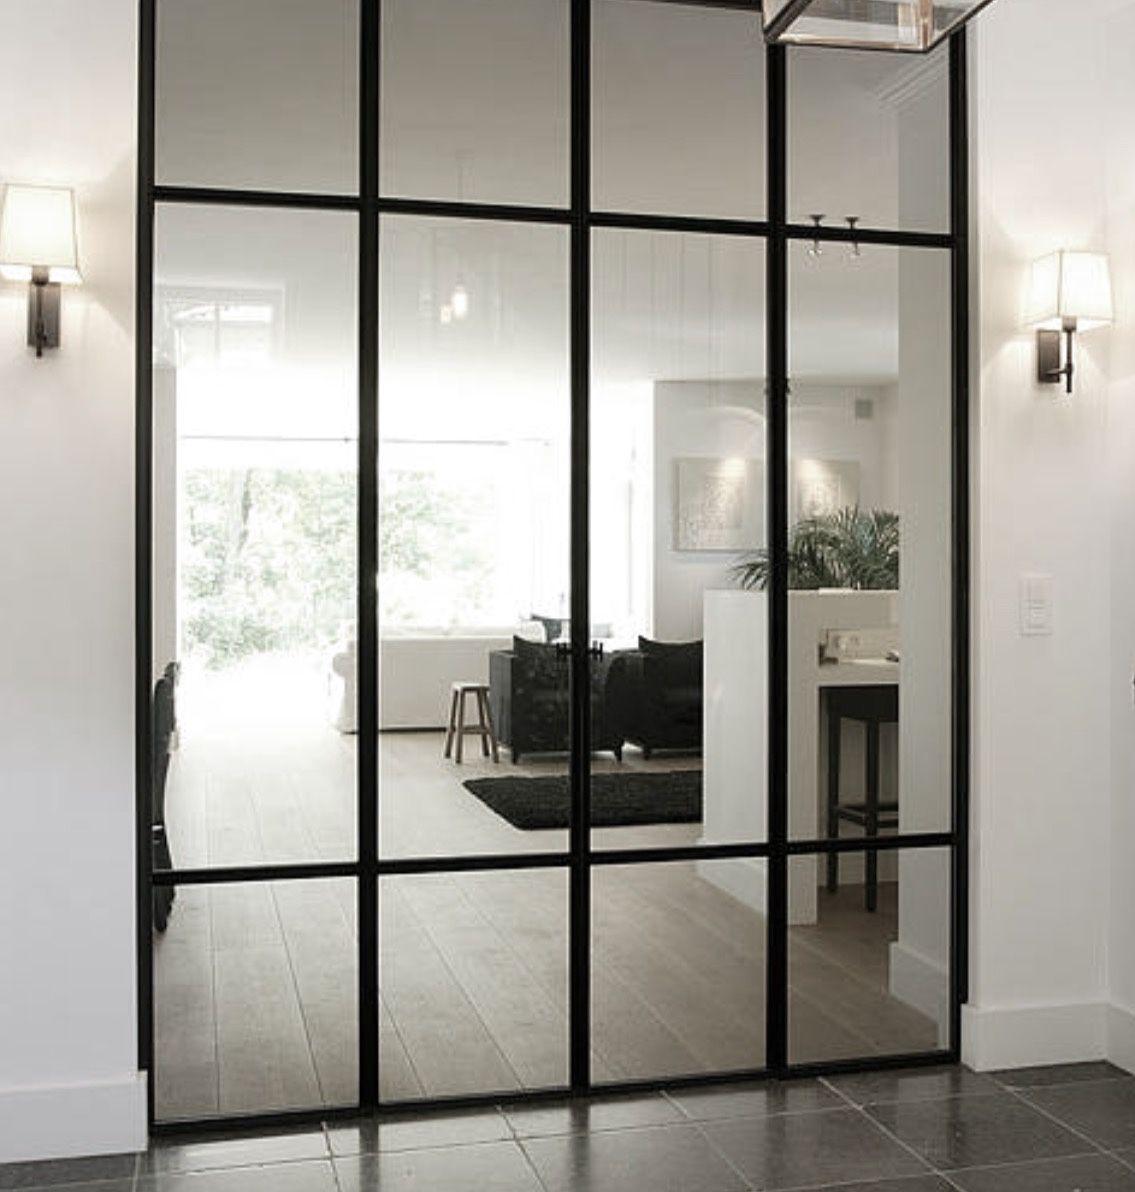 Style atelier martine haddouche doors pinterest innenraum fenster ve vorzimmer - Fenster style ...